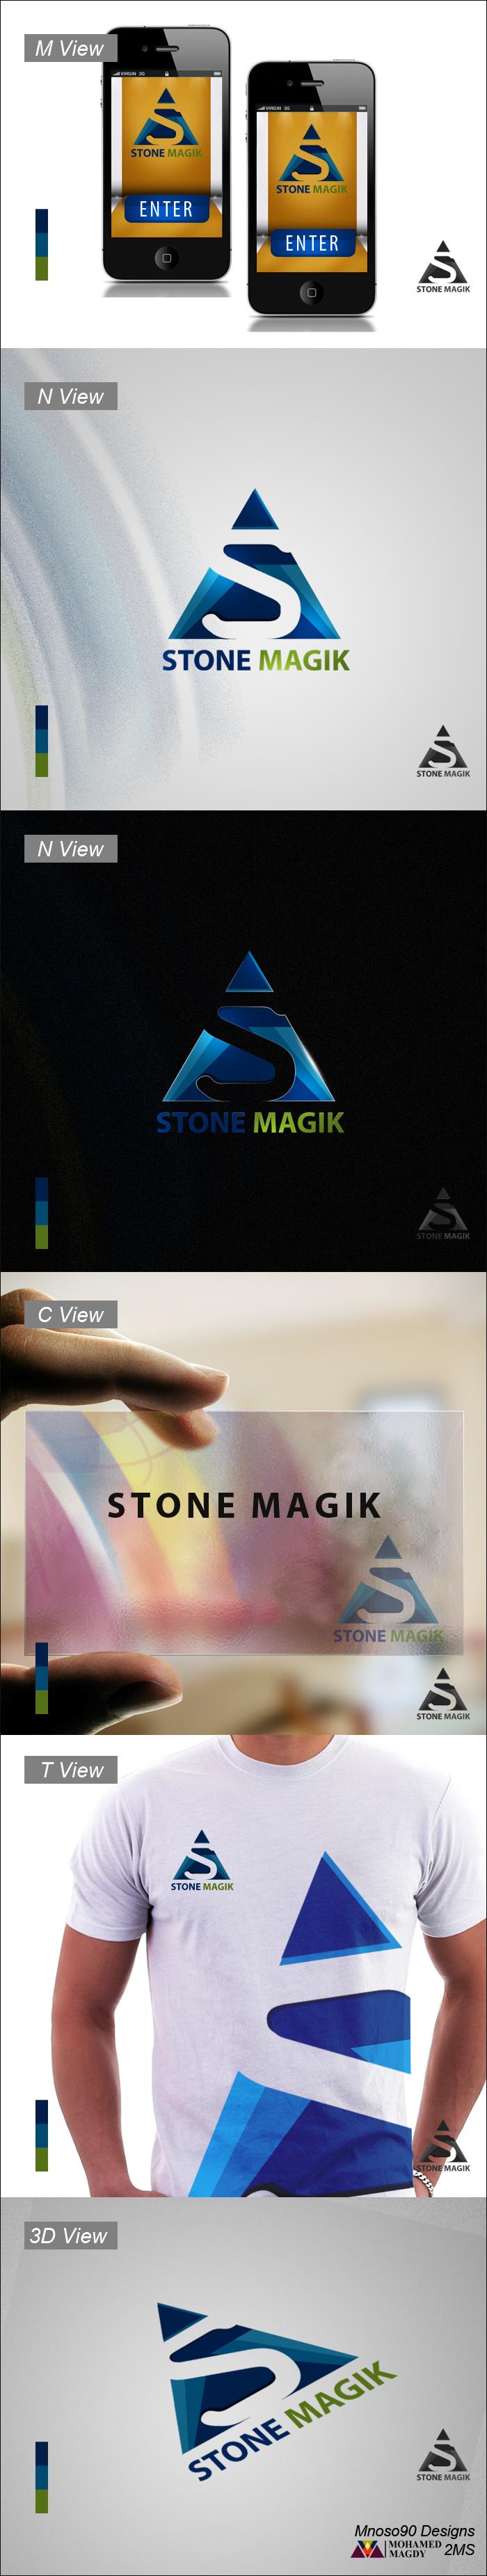 Stone magik logo by mnoso90